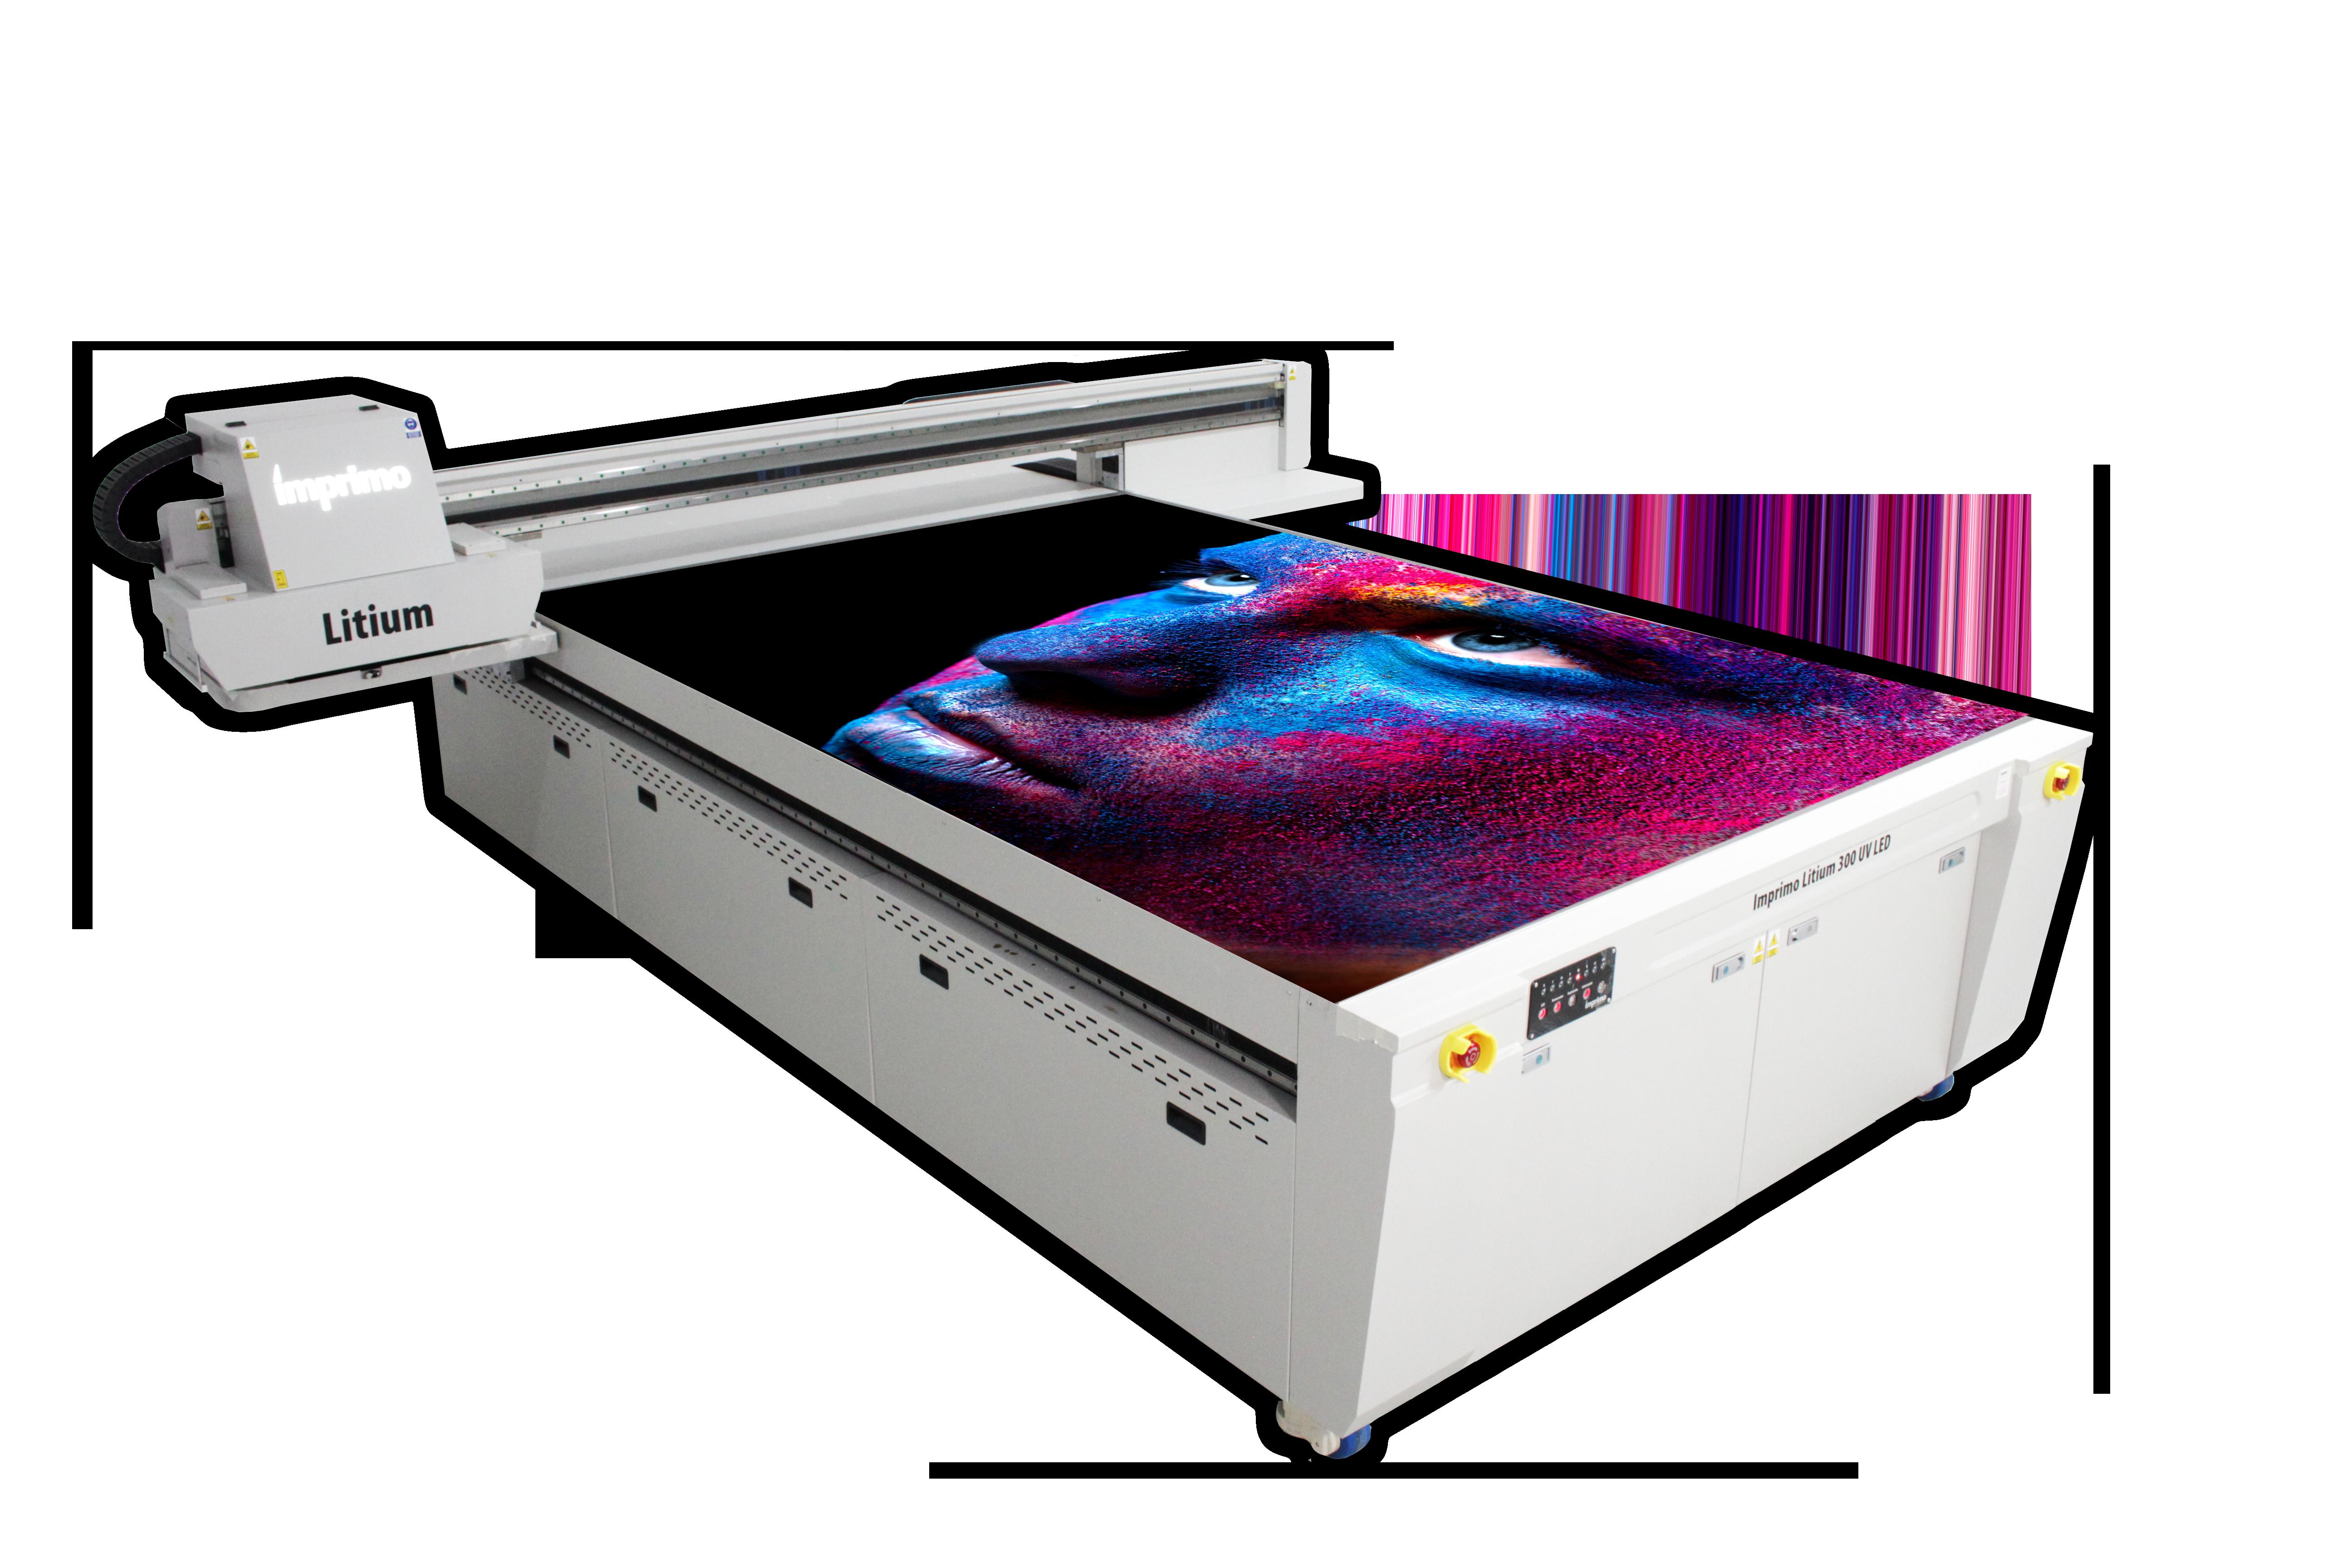 Litium 300 UV LED